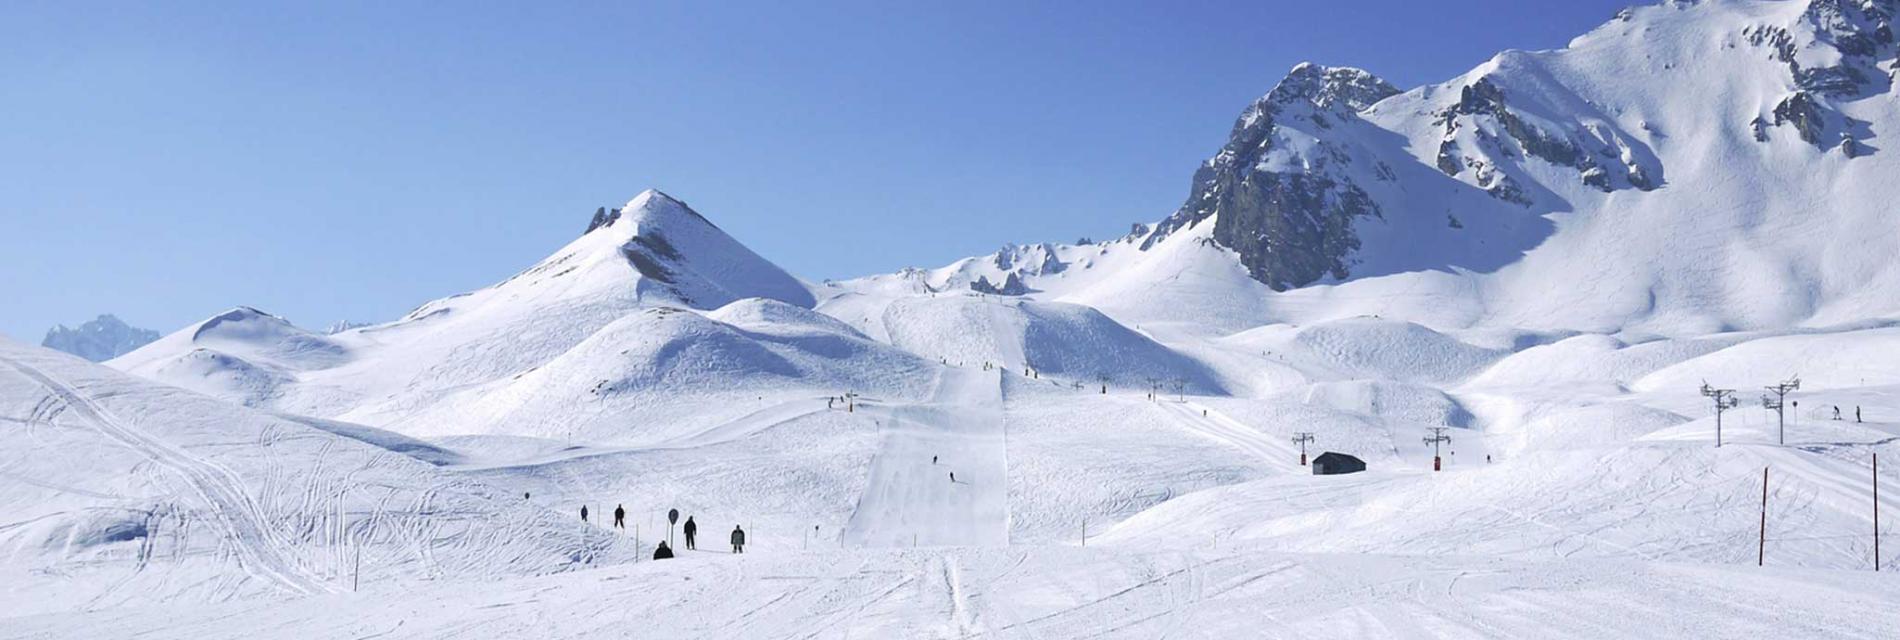 Slide le domaine skiable